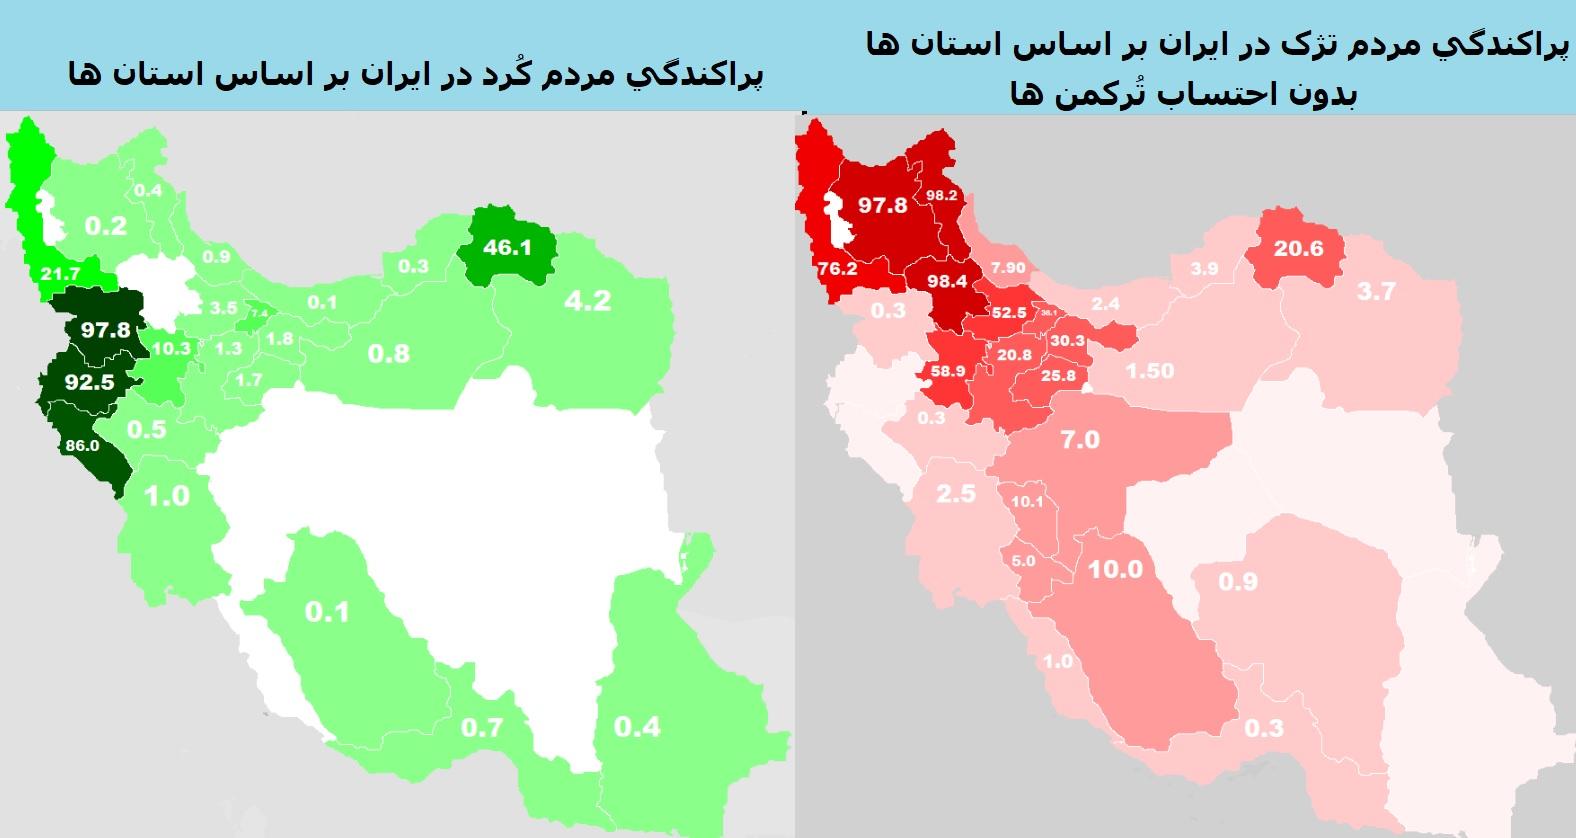 Turkic kurdish people in provinces of Iran